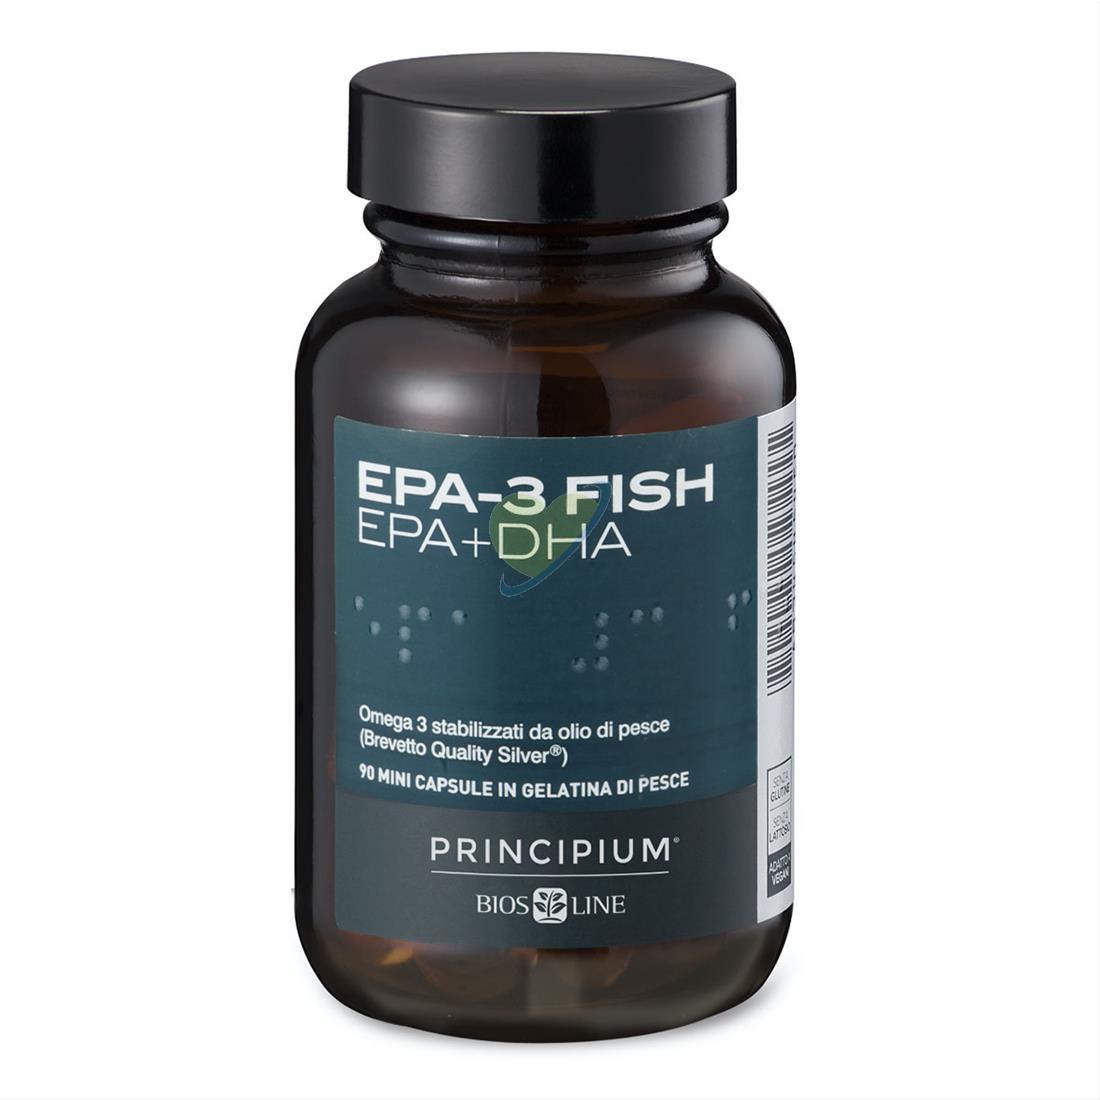 Bios Line Principium EPA 3 Fish EPA + DHA Integratore Alimentare 90 Mini Capsule